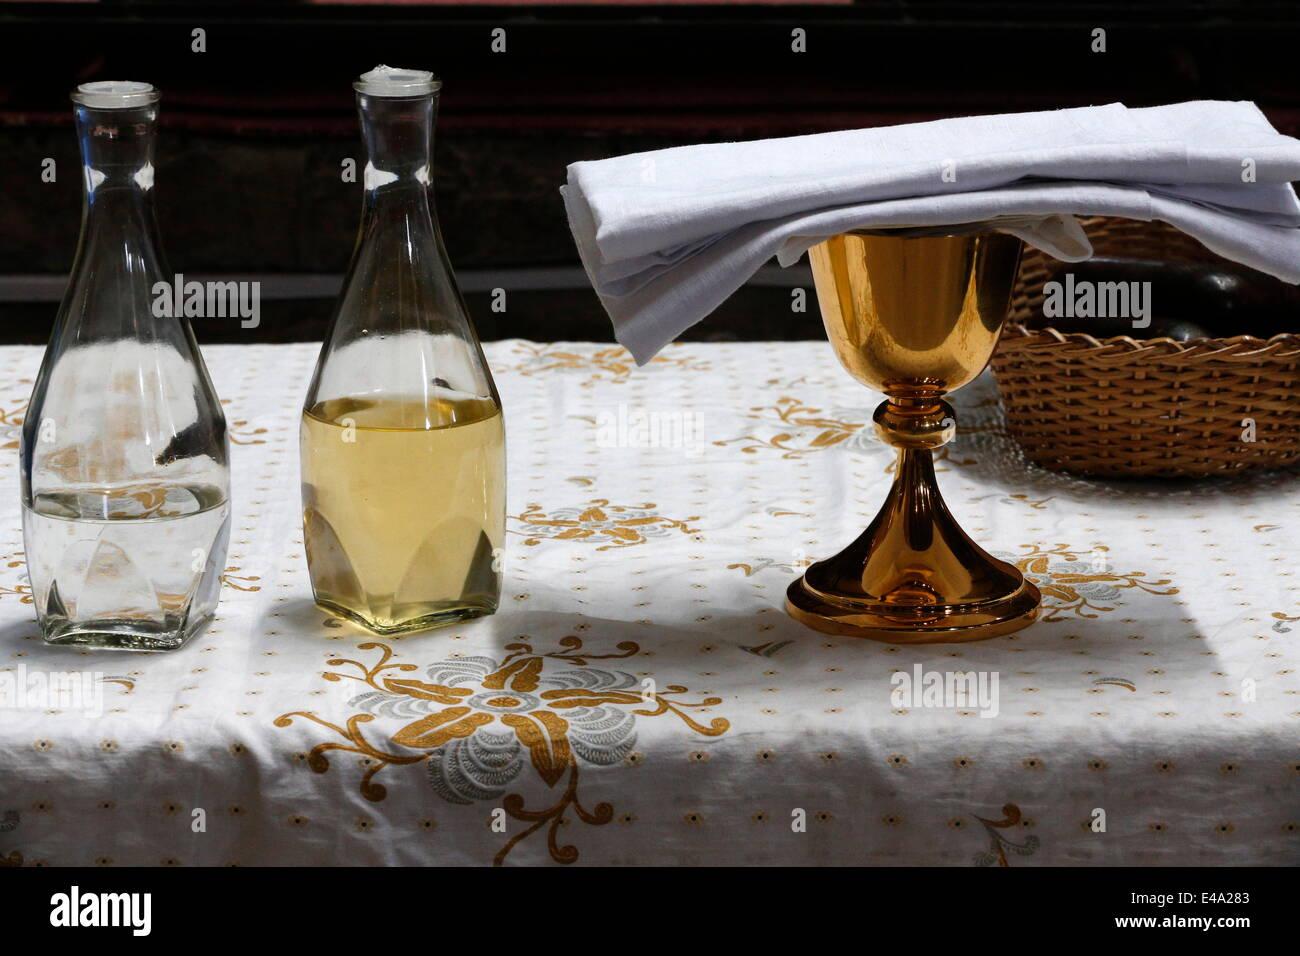 Eucharist, water and wine, St. Anne's Basilica, Brazzaville, Congo, Africa - Stock Image